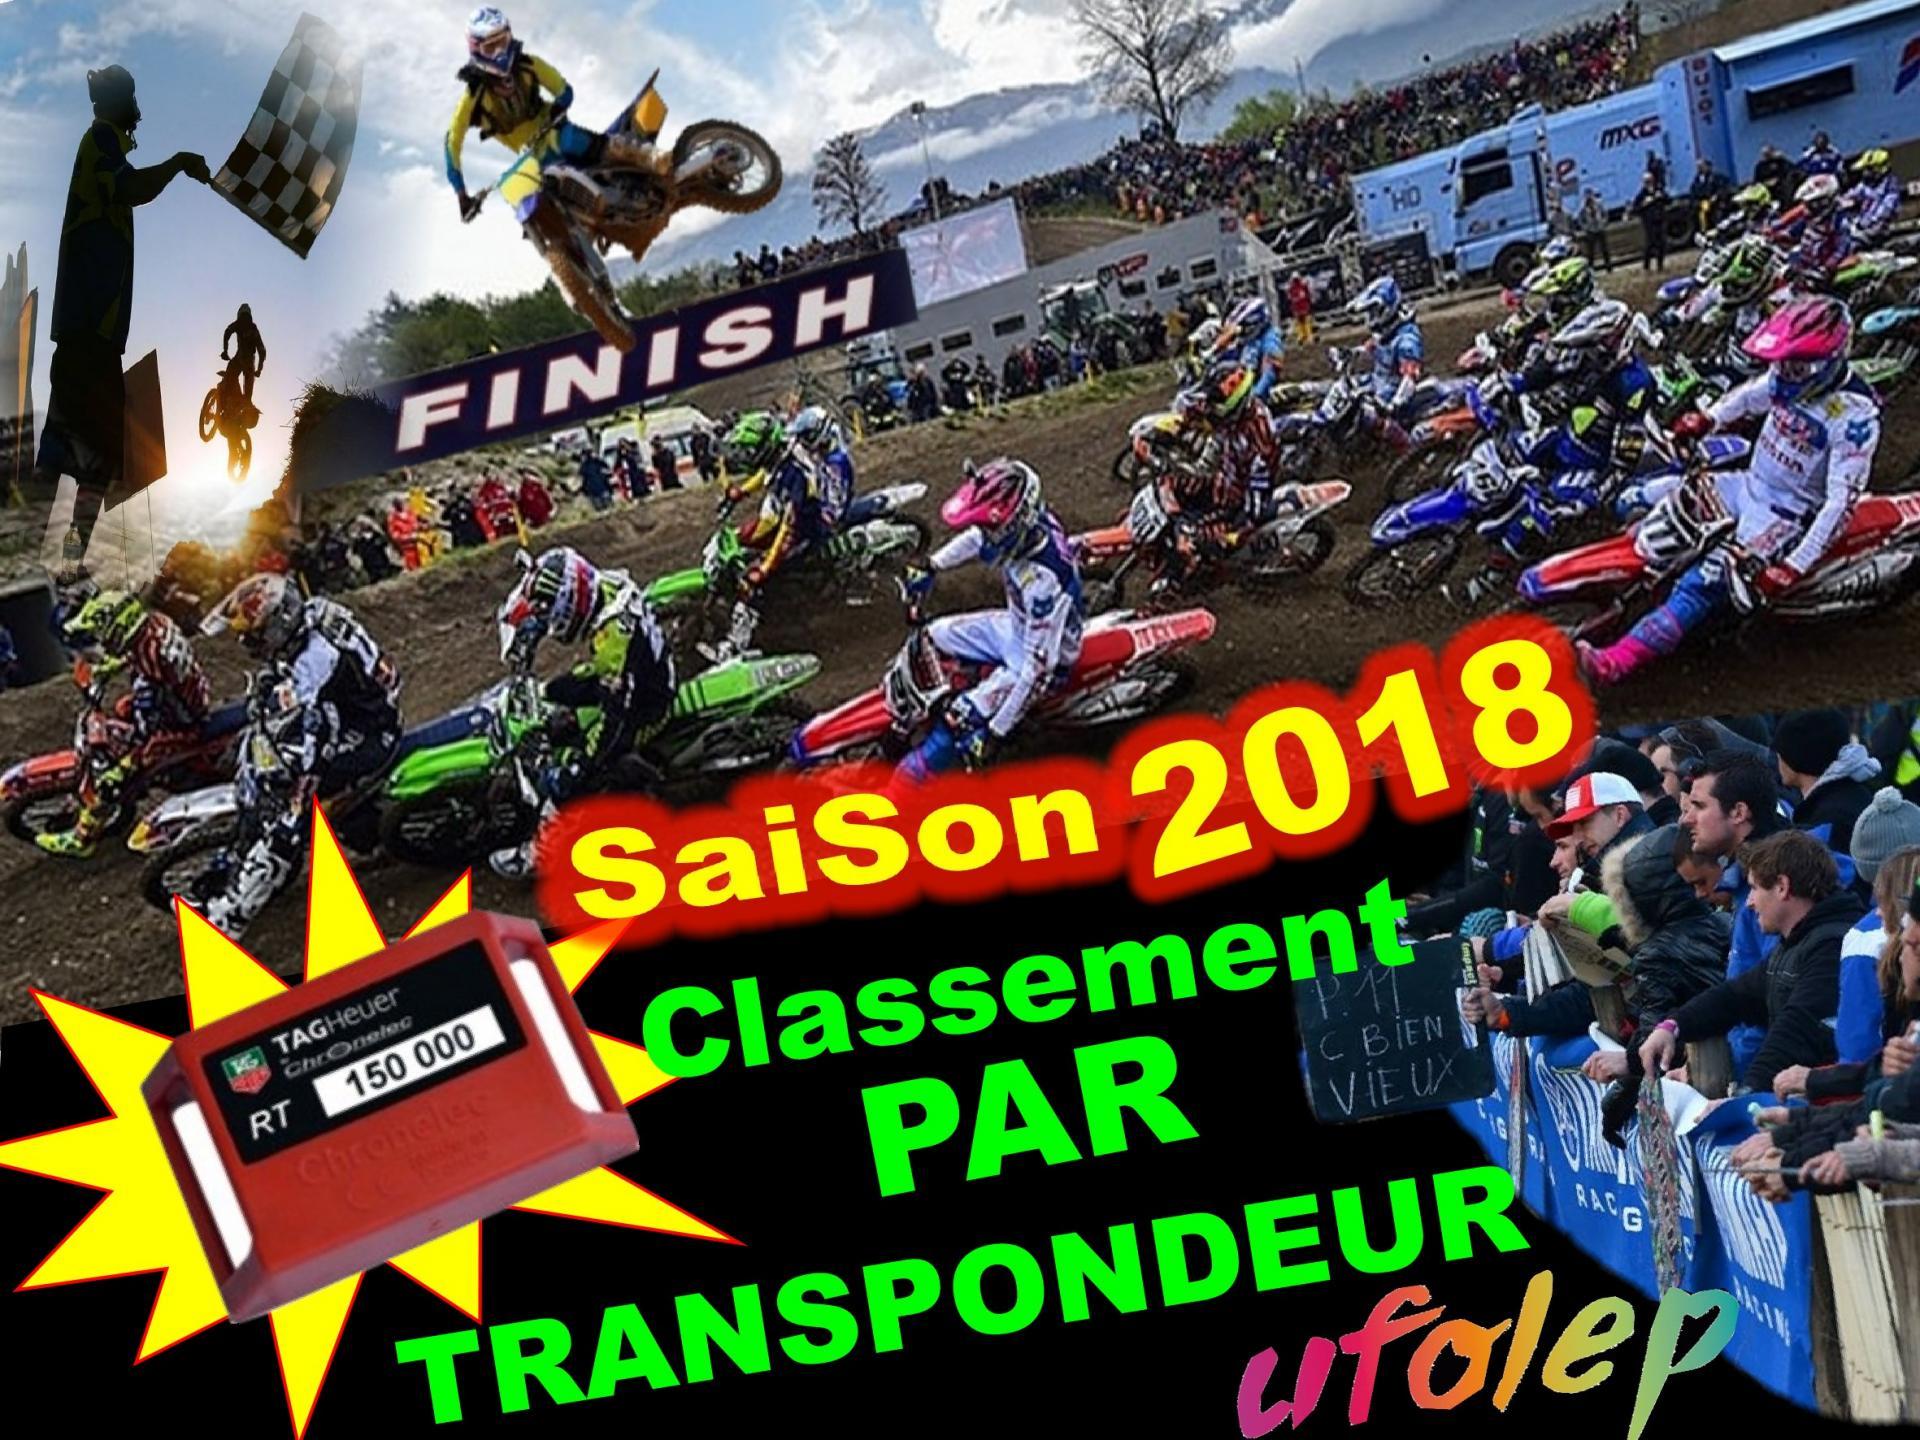 Pub transpondeur 2018